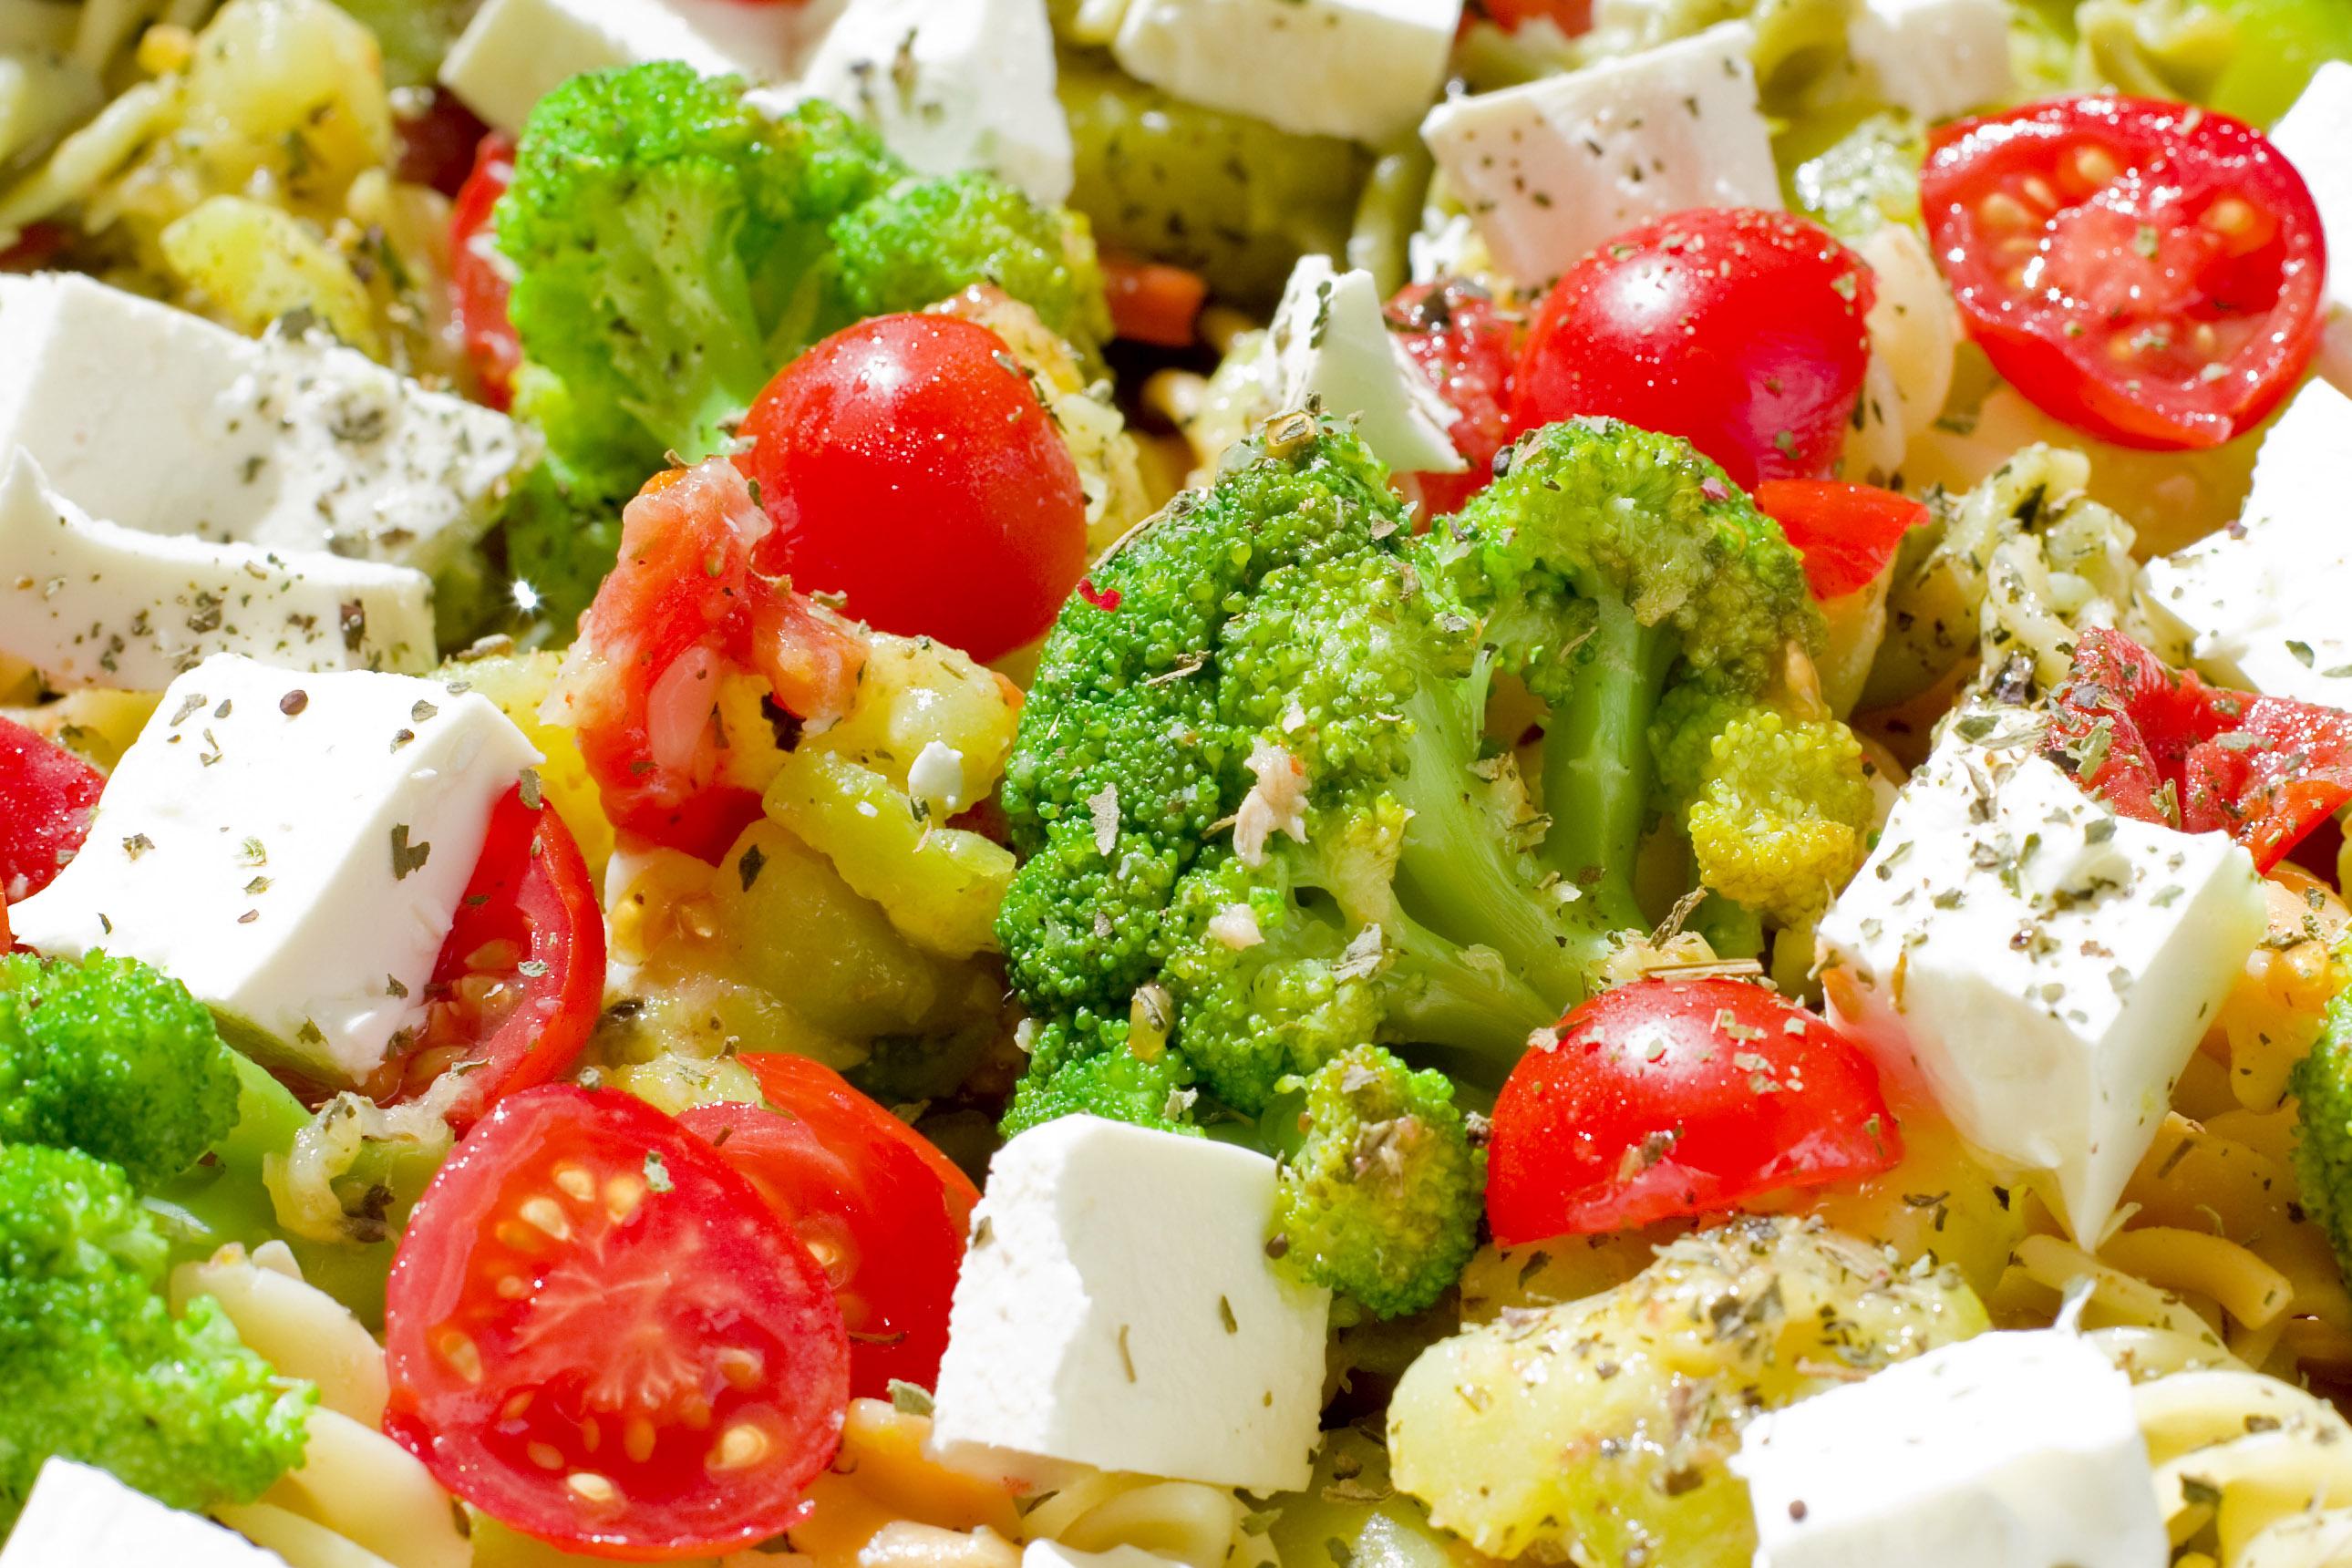 Ensalada De Verano Con Brócoli